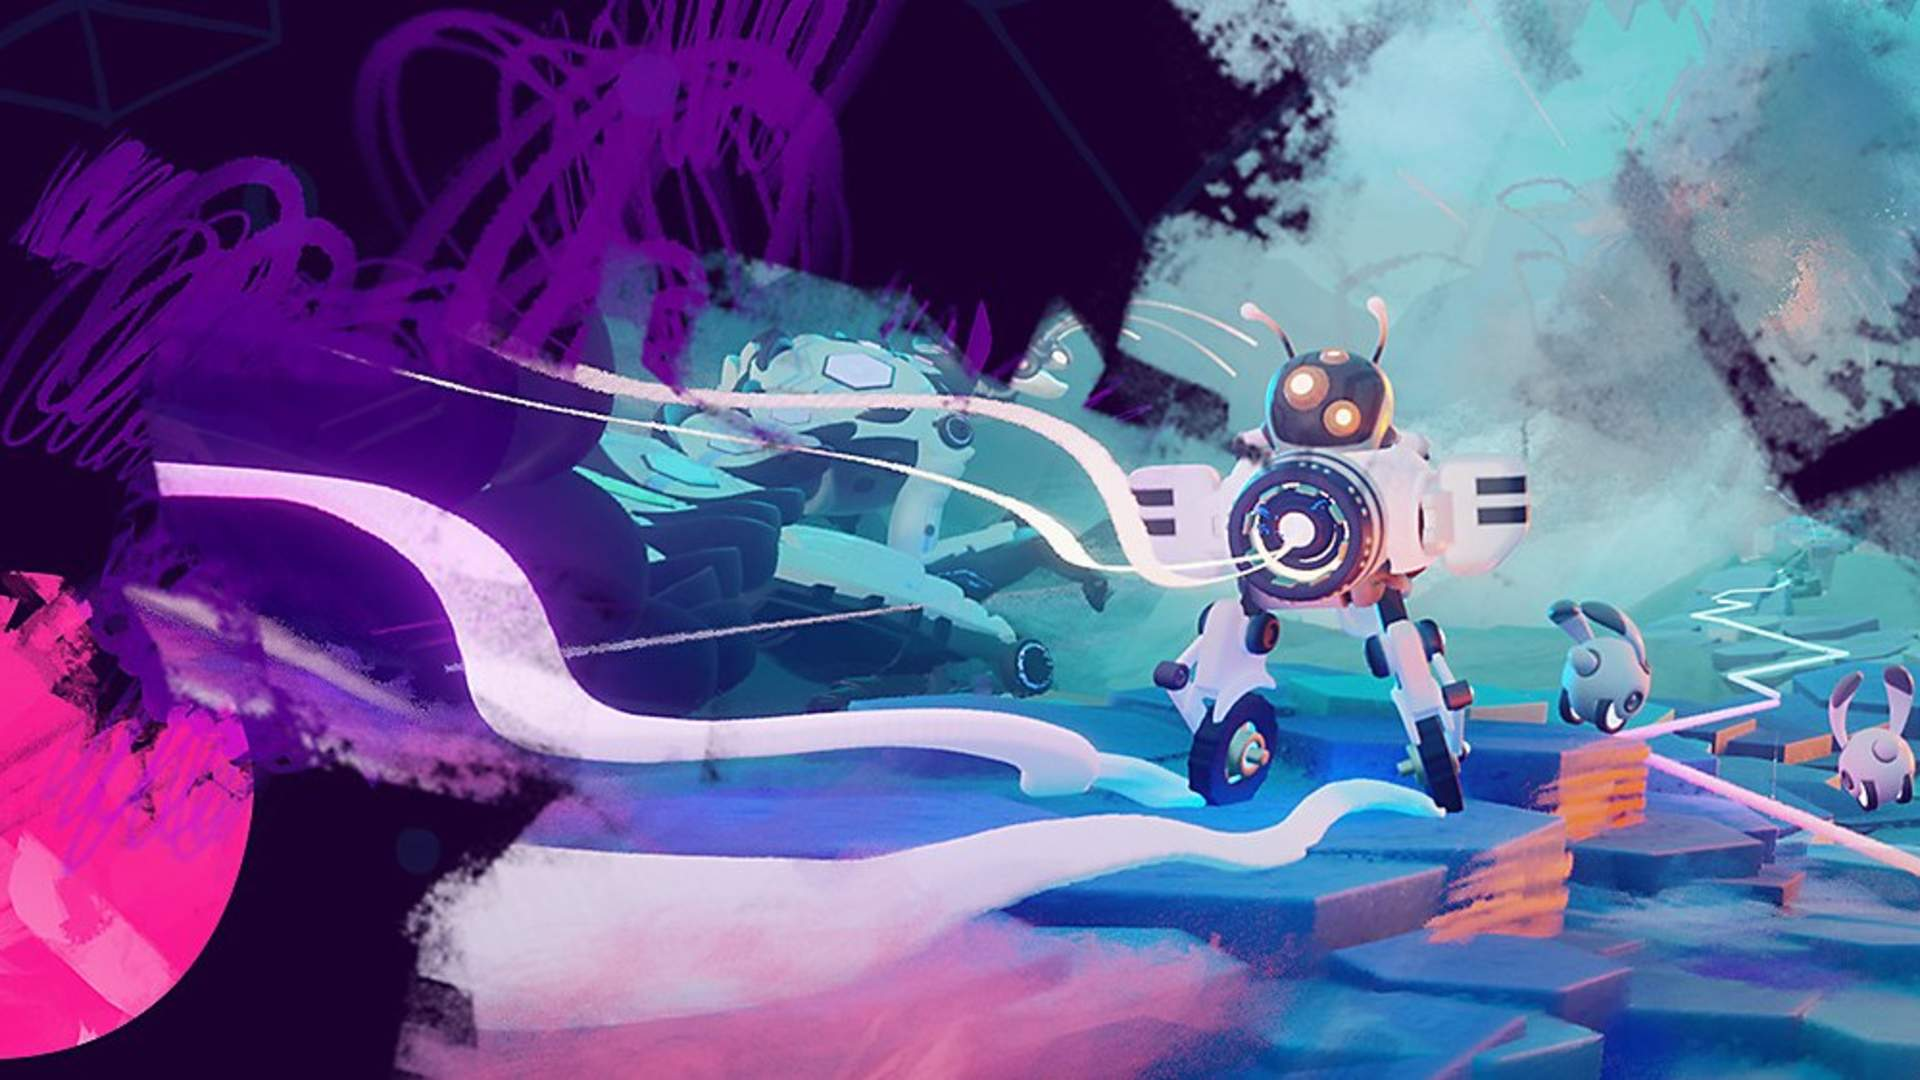 Media Molecule Dreams creating next generation of game designers, easy game design